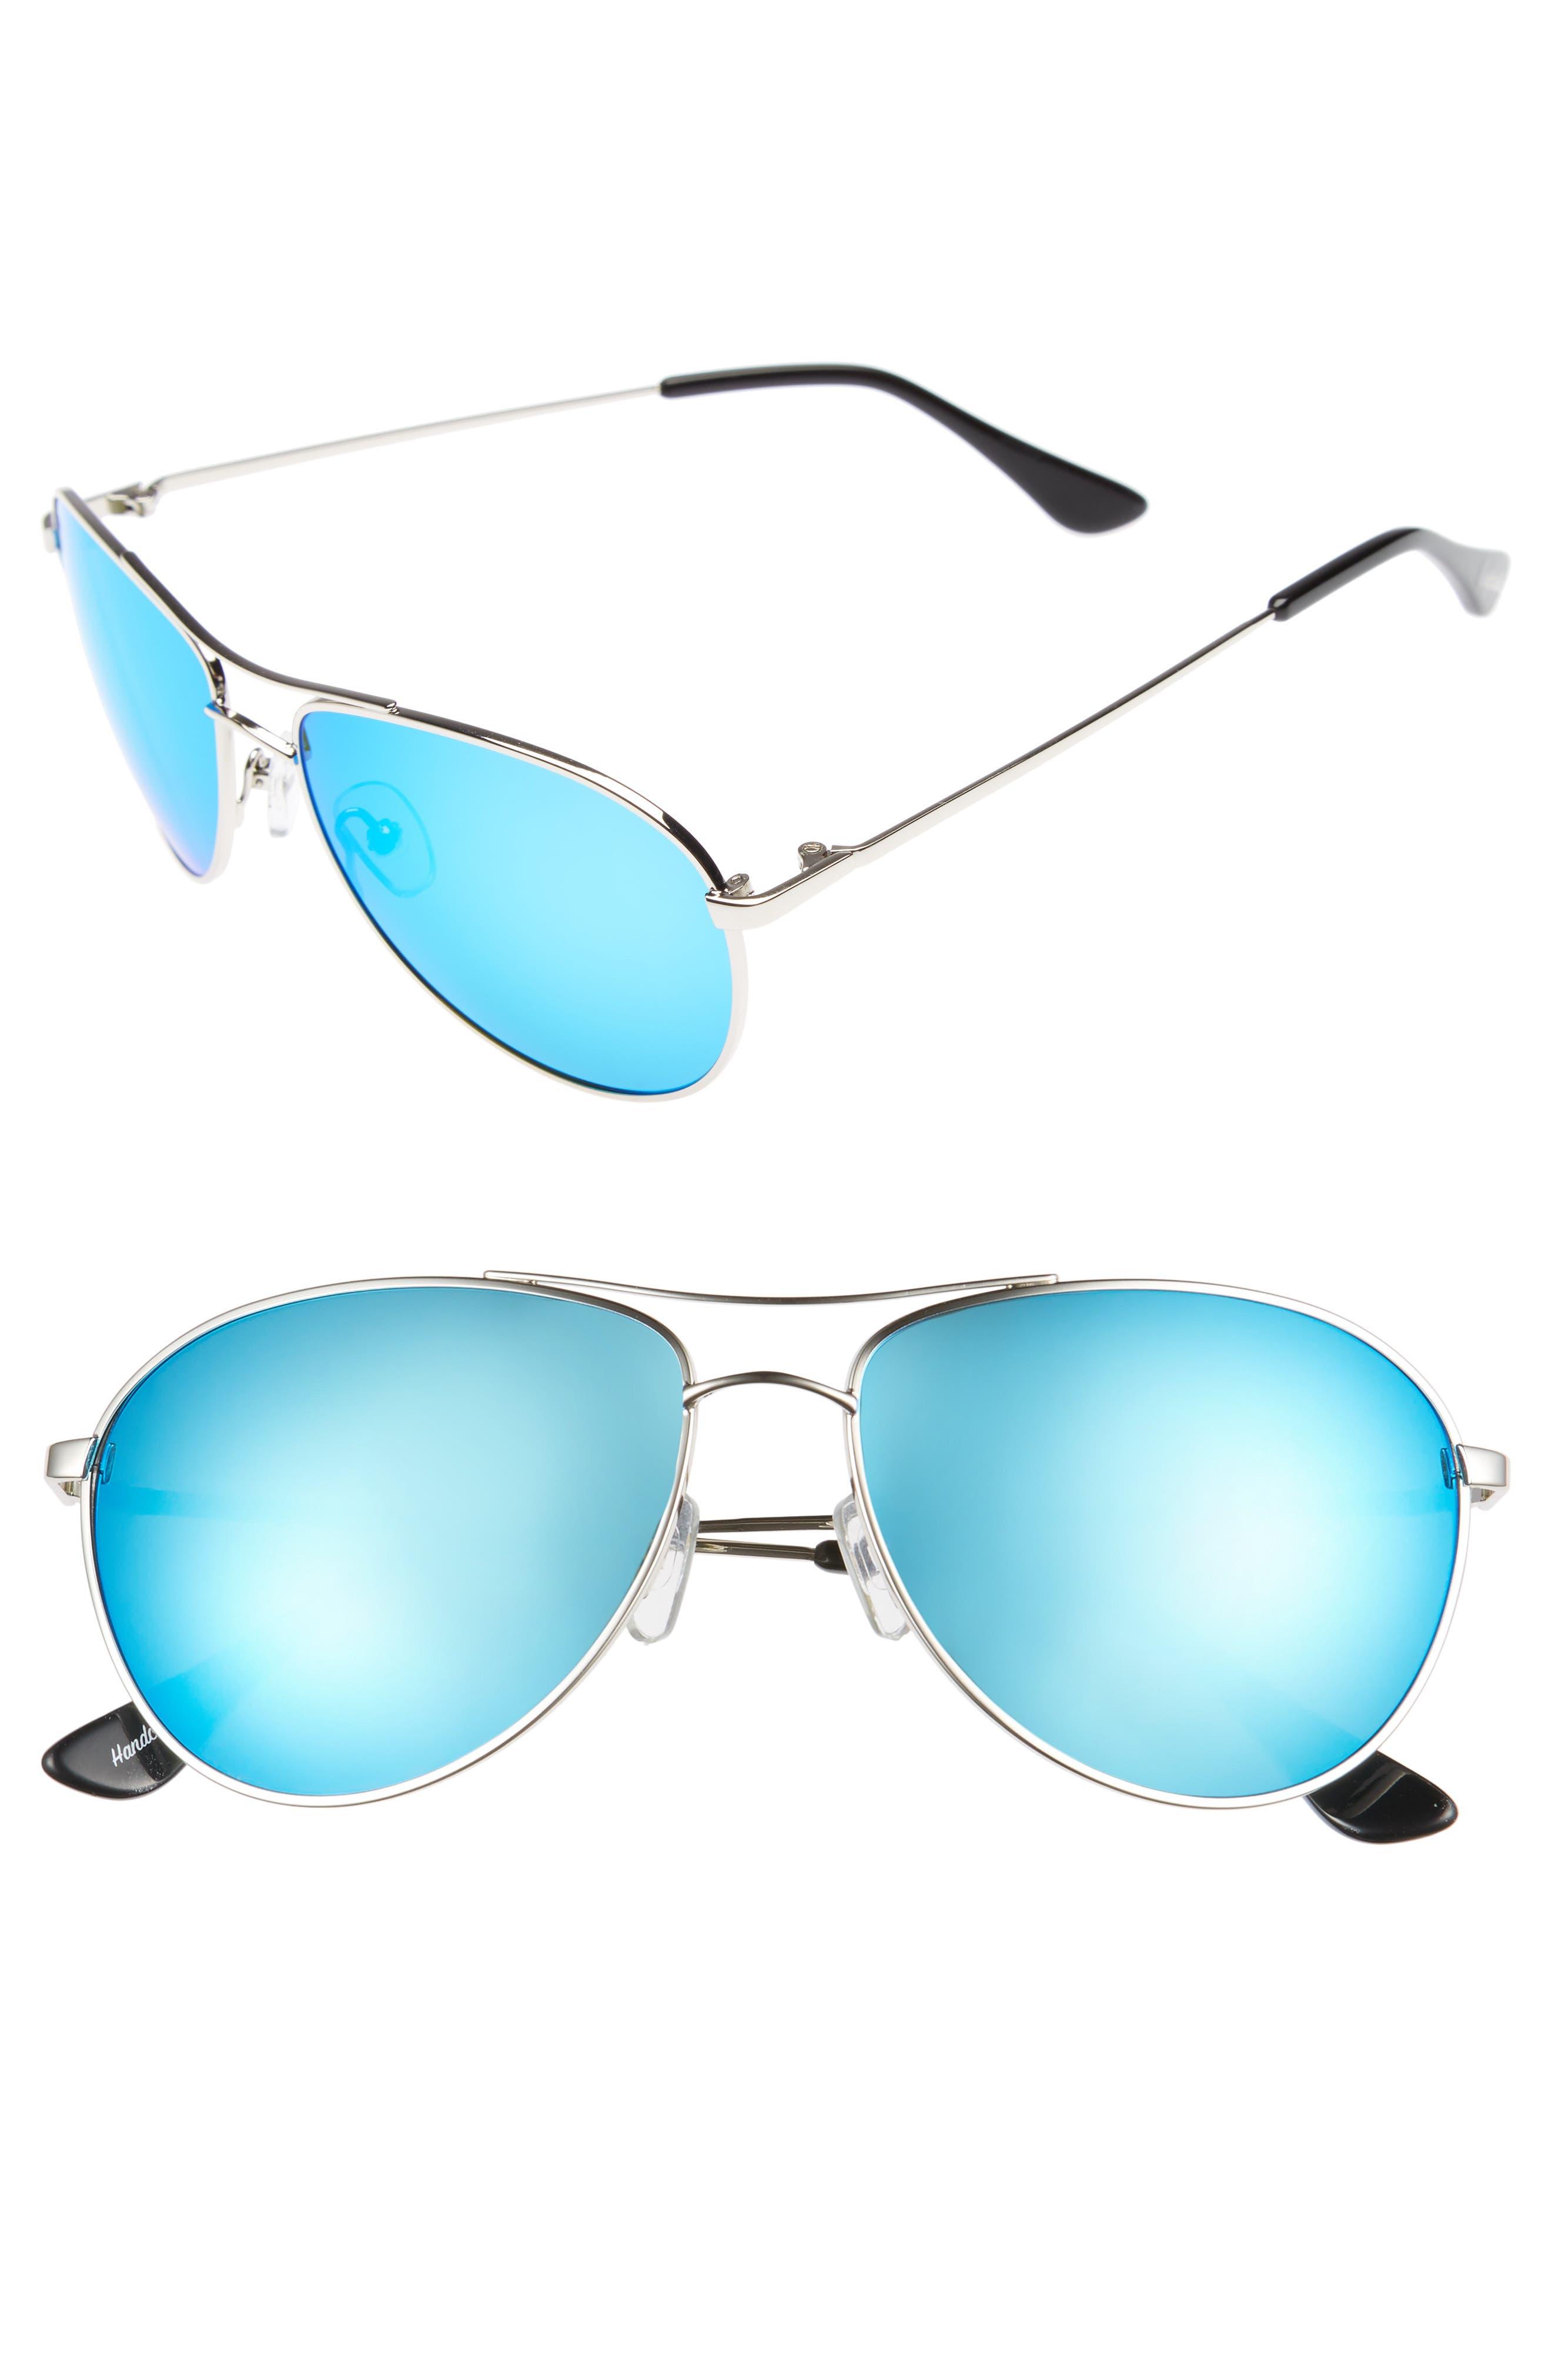 Orville 58mm Mirrored Aviator Sunglasses,                         Main,                         color, Silver/ Blue Polar